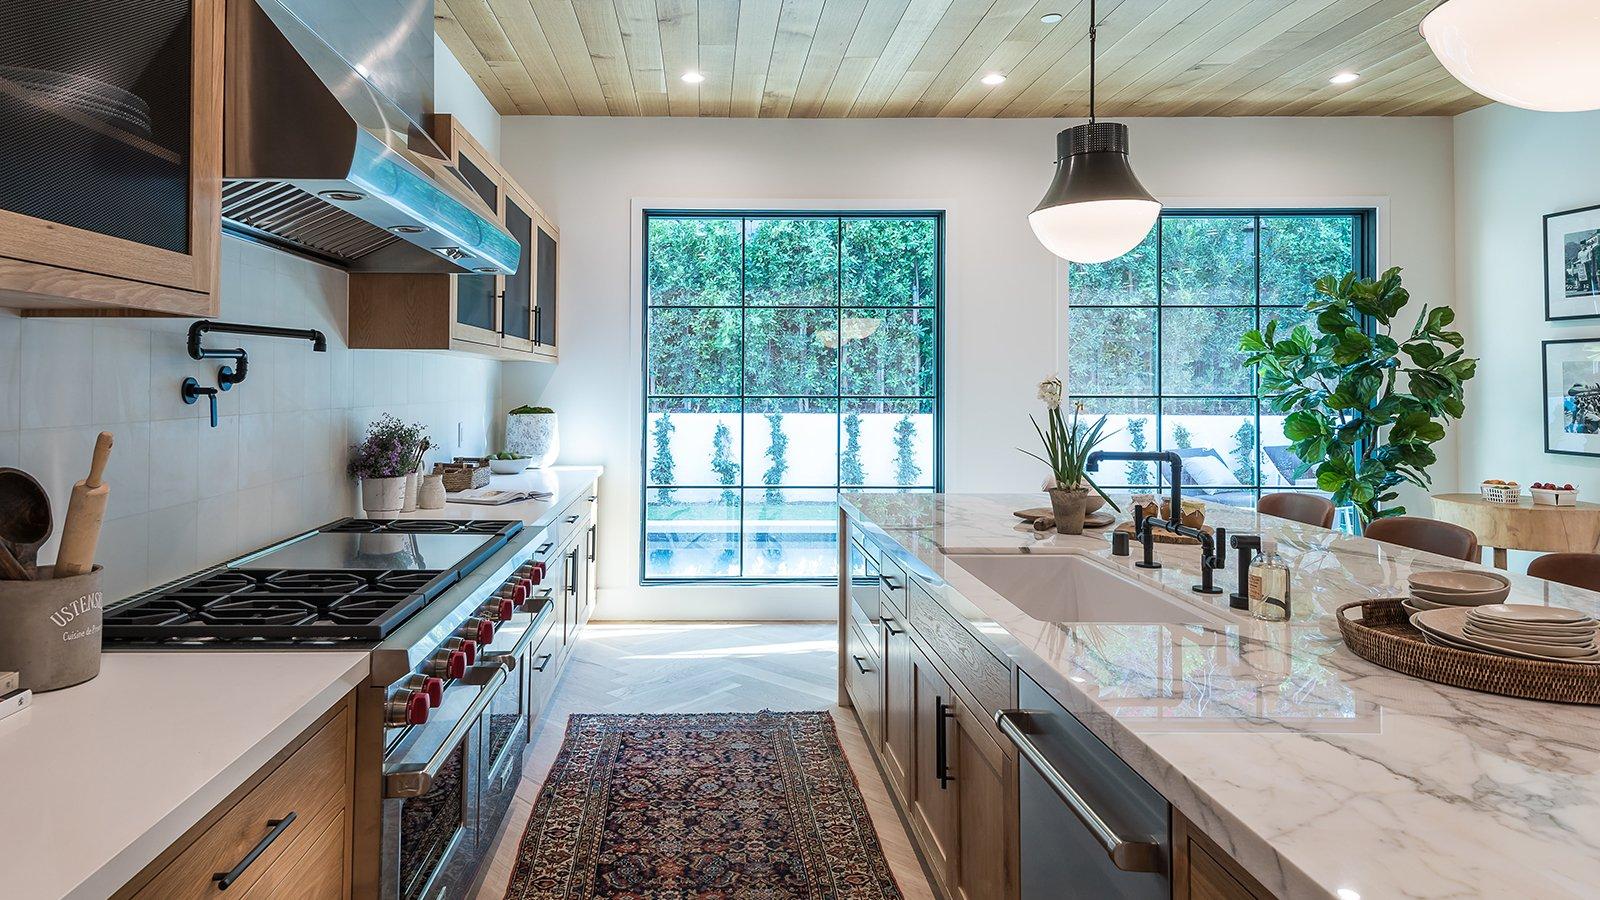 Modern kitchen with large windows